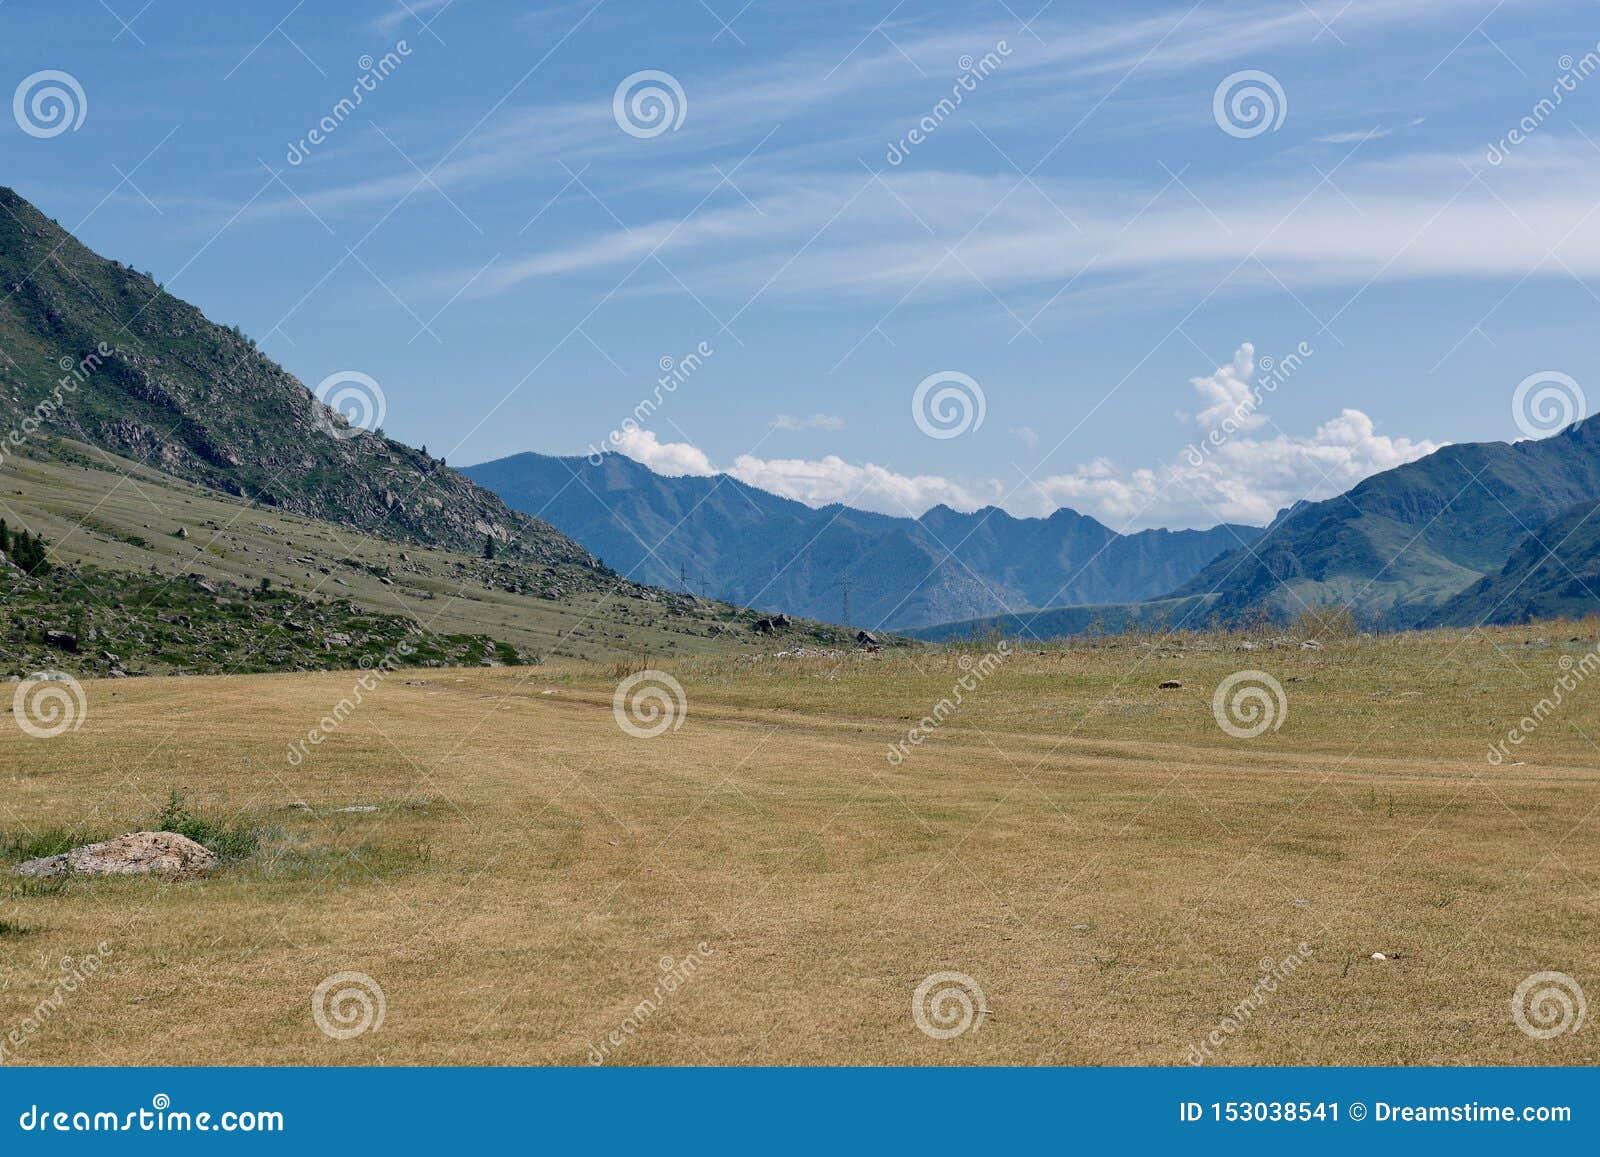 Gorny Altai, Сибирь, Российская Федерация